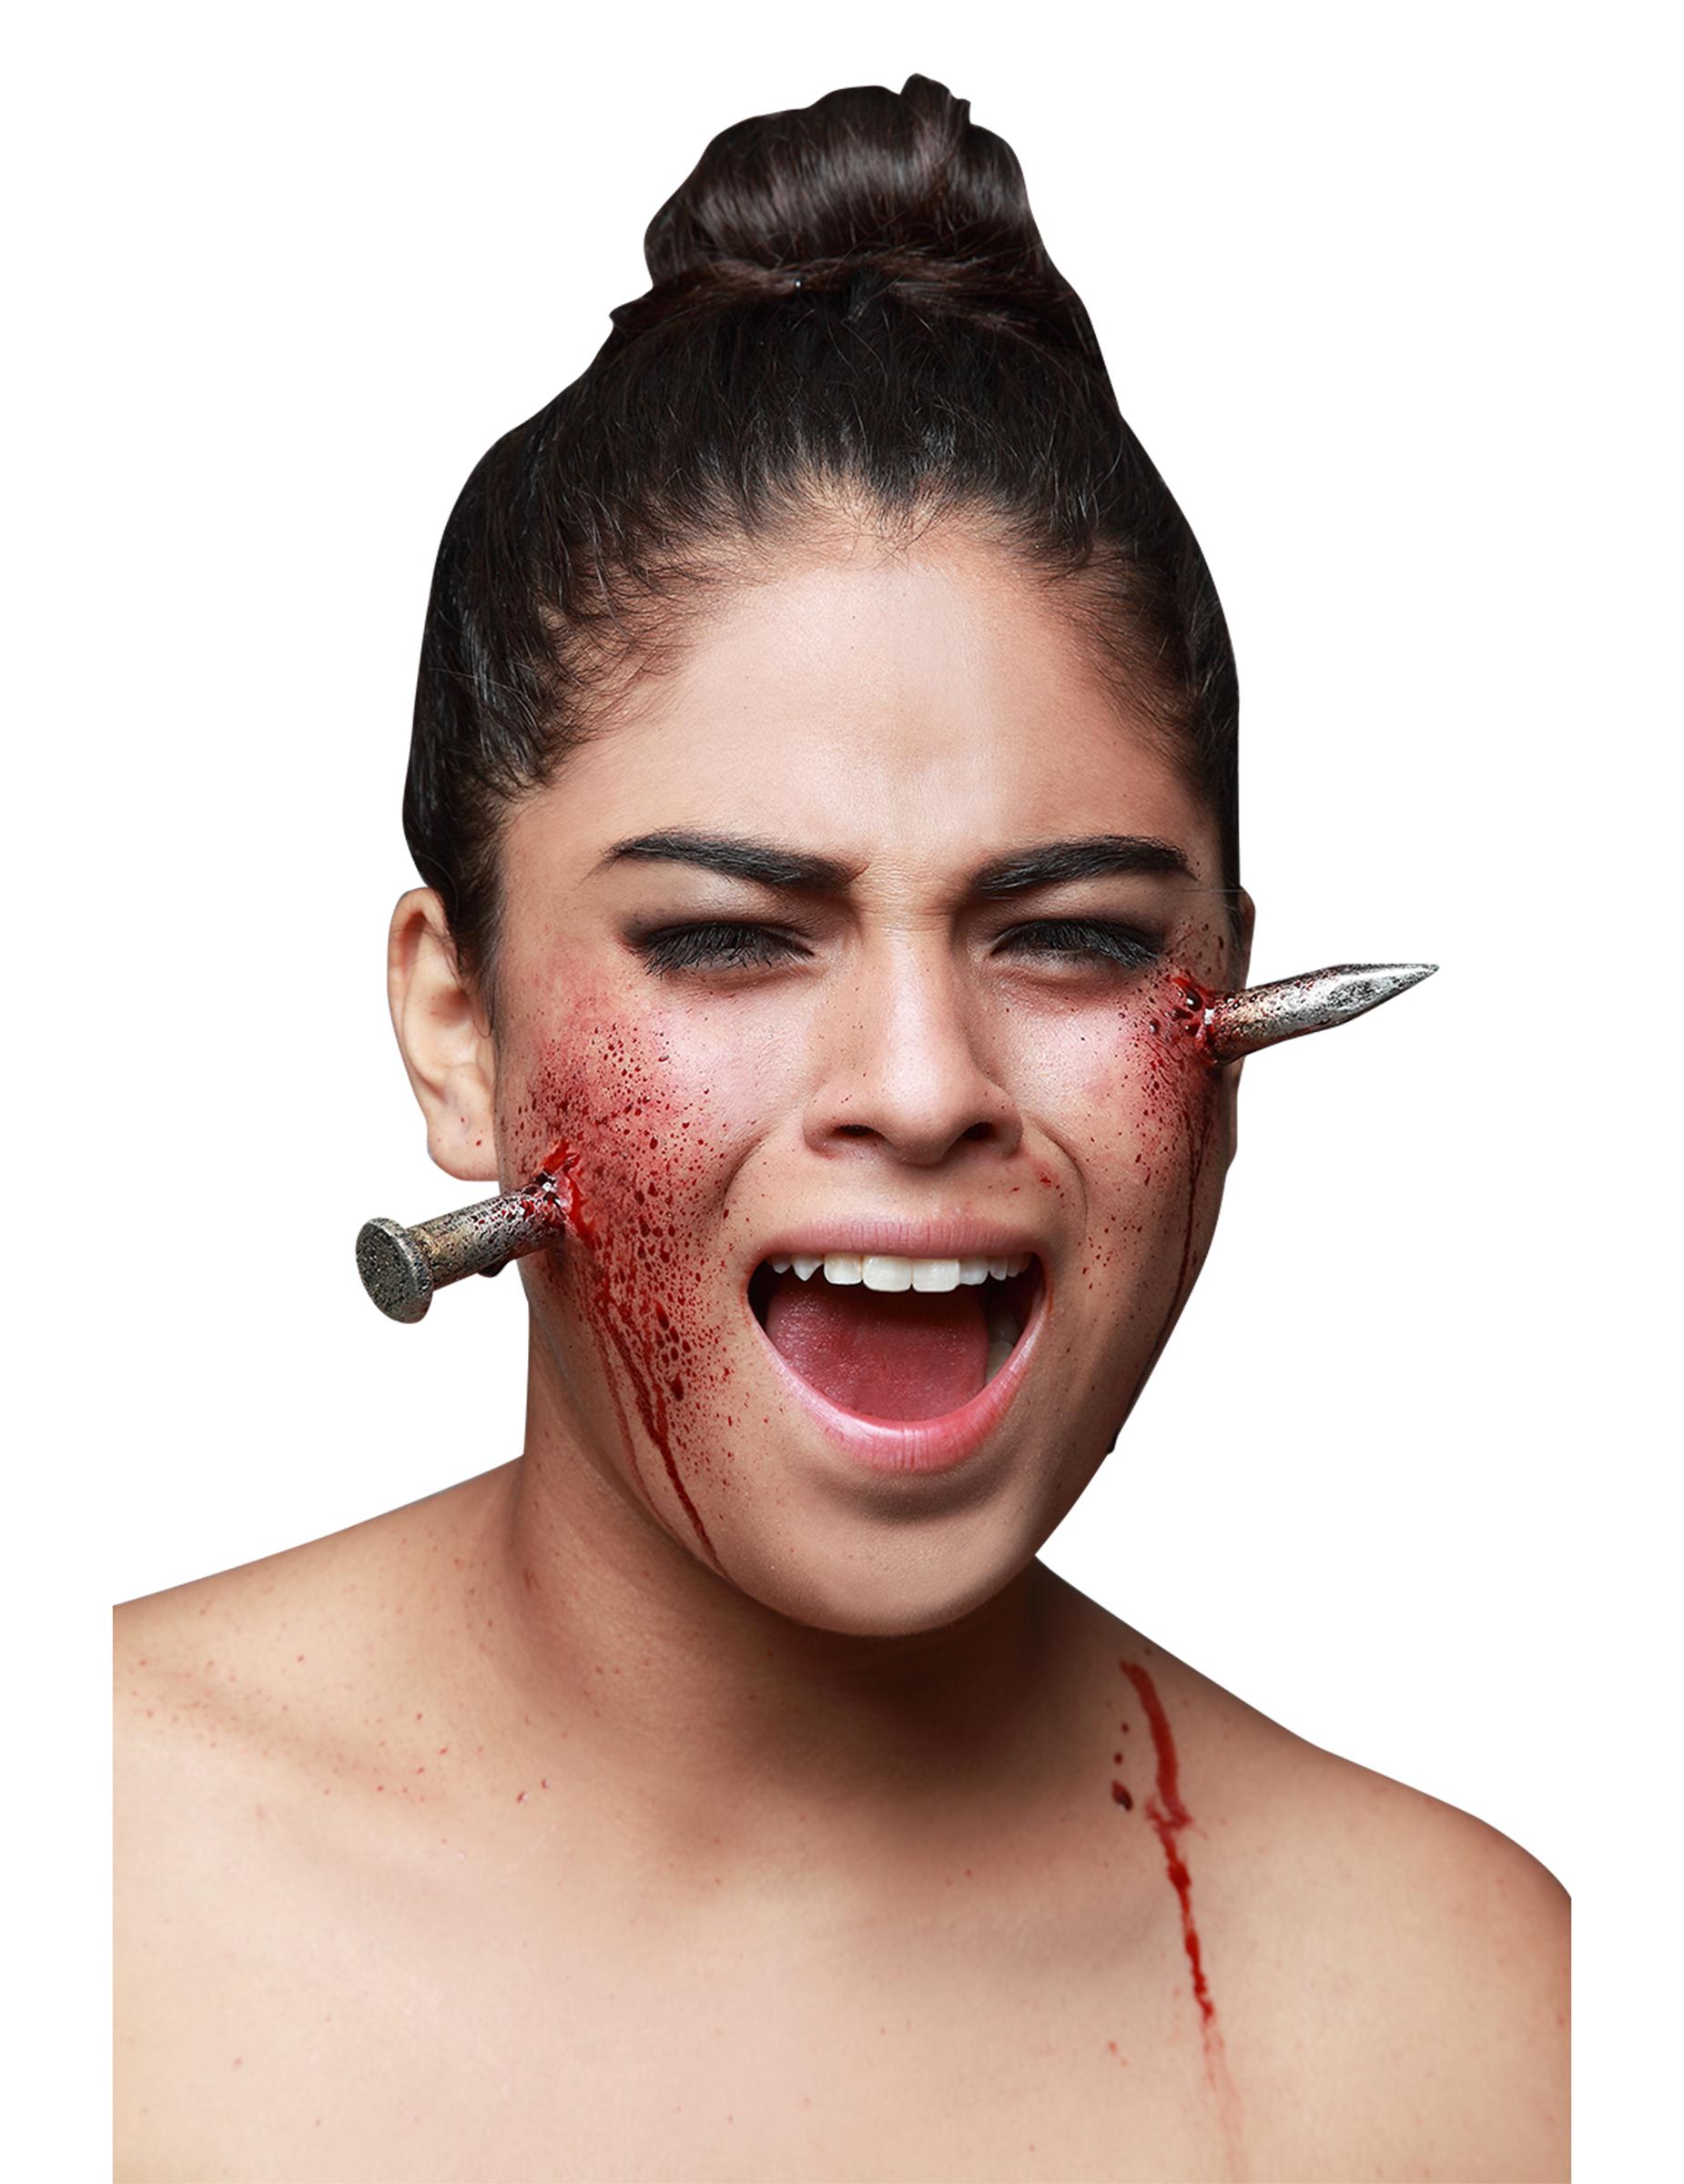 Fausse blessure clou g ant adulte halloween achat de maquillage sur vegaoopro grossiste en - Maquillage latex halloween ...